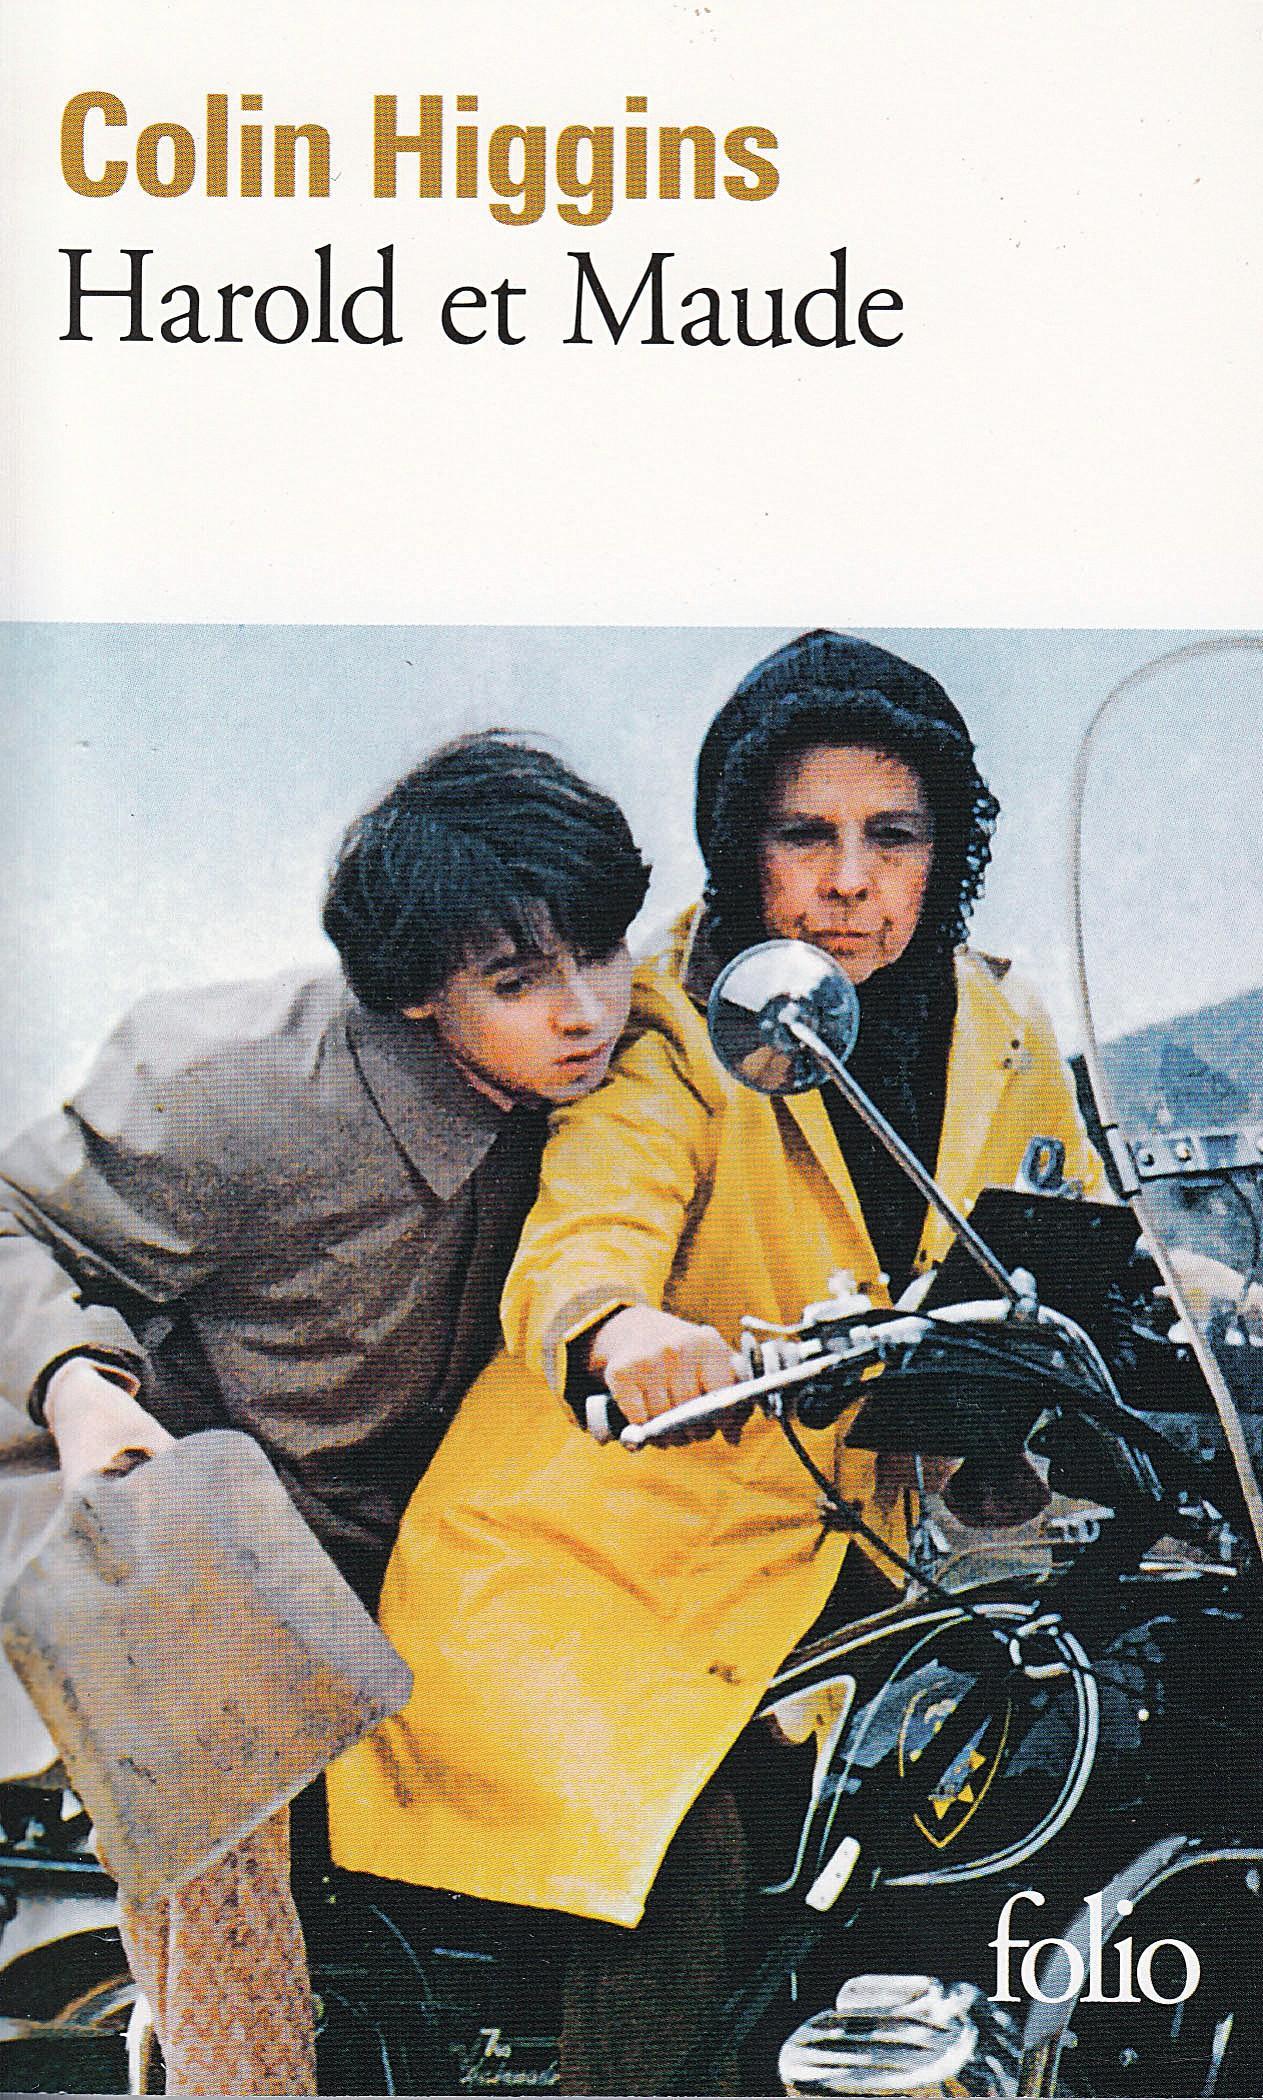 Couverture Harold et Maud, Colin Higgins, 1973.